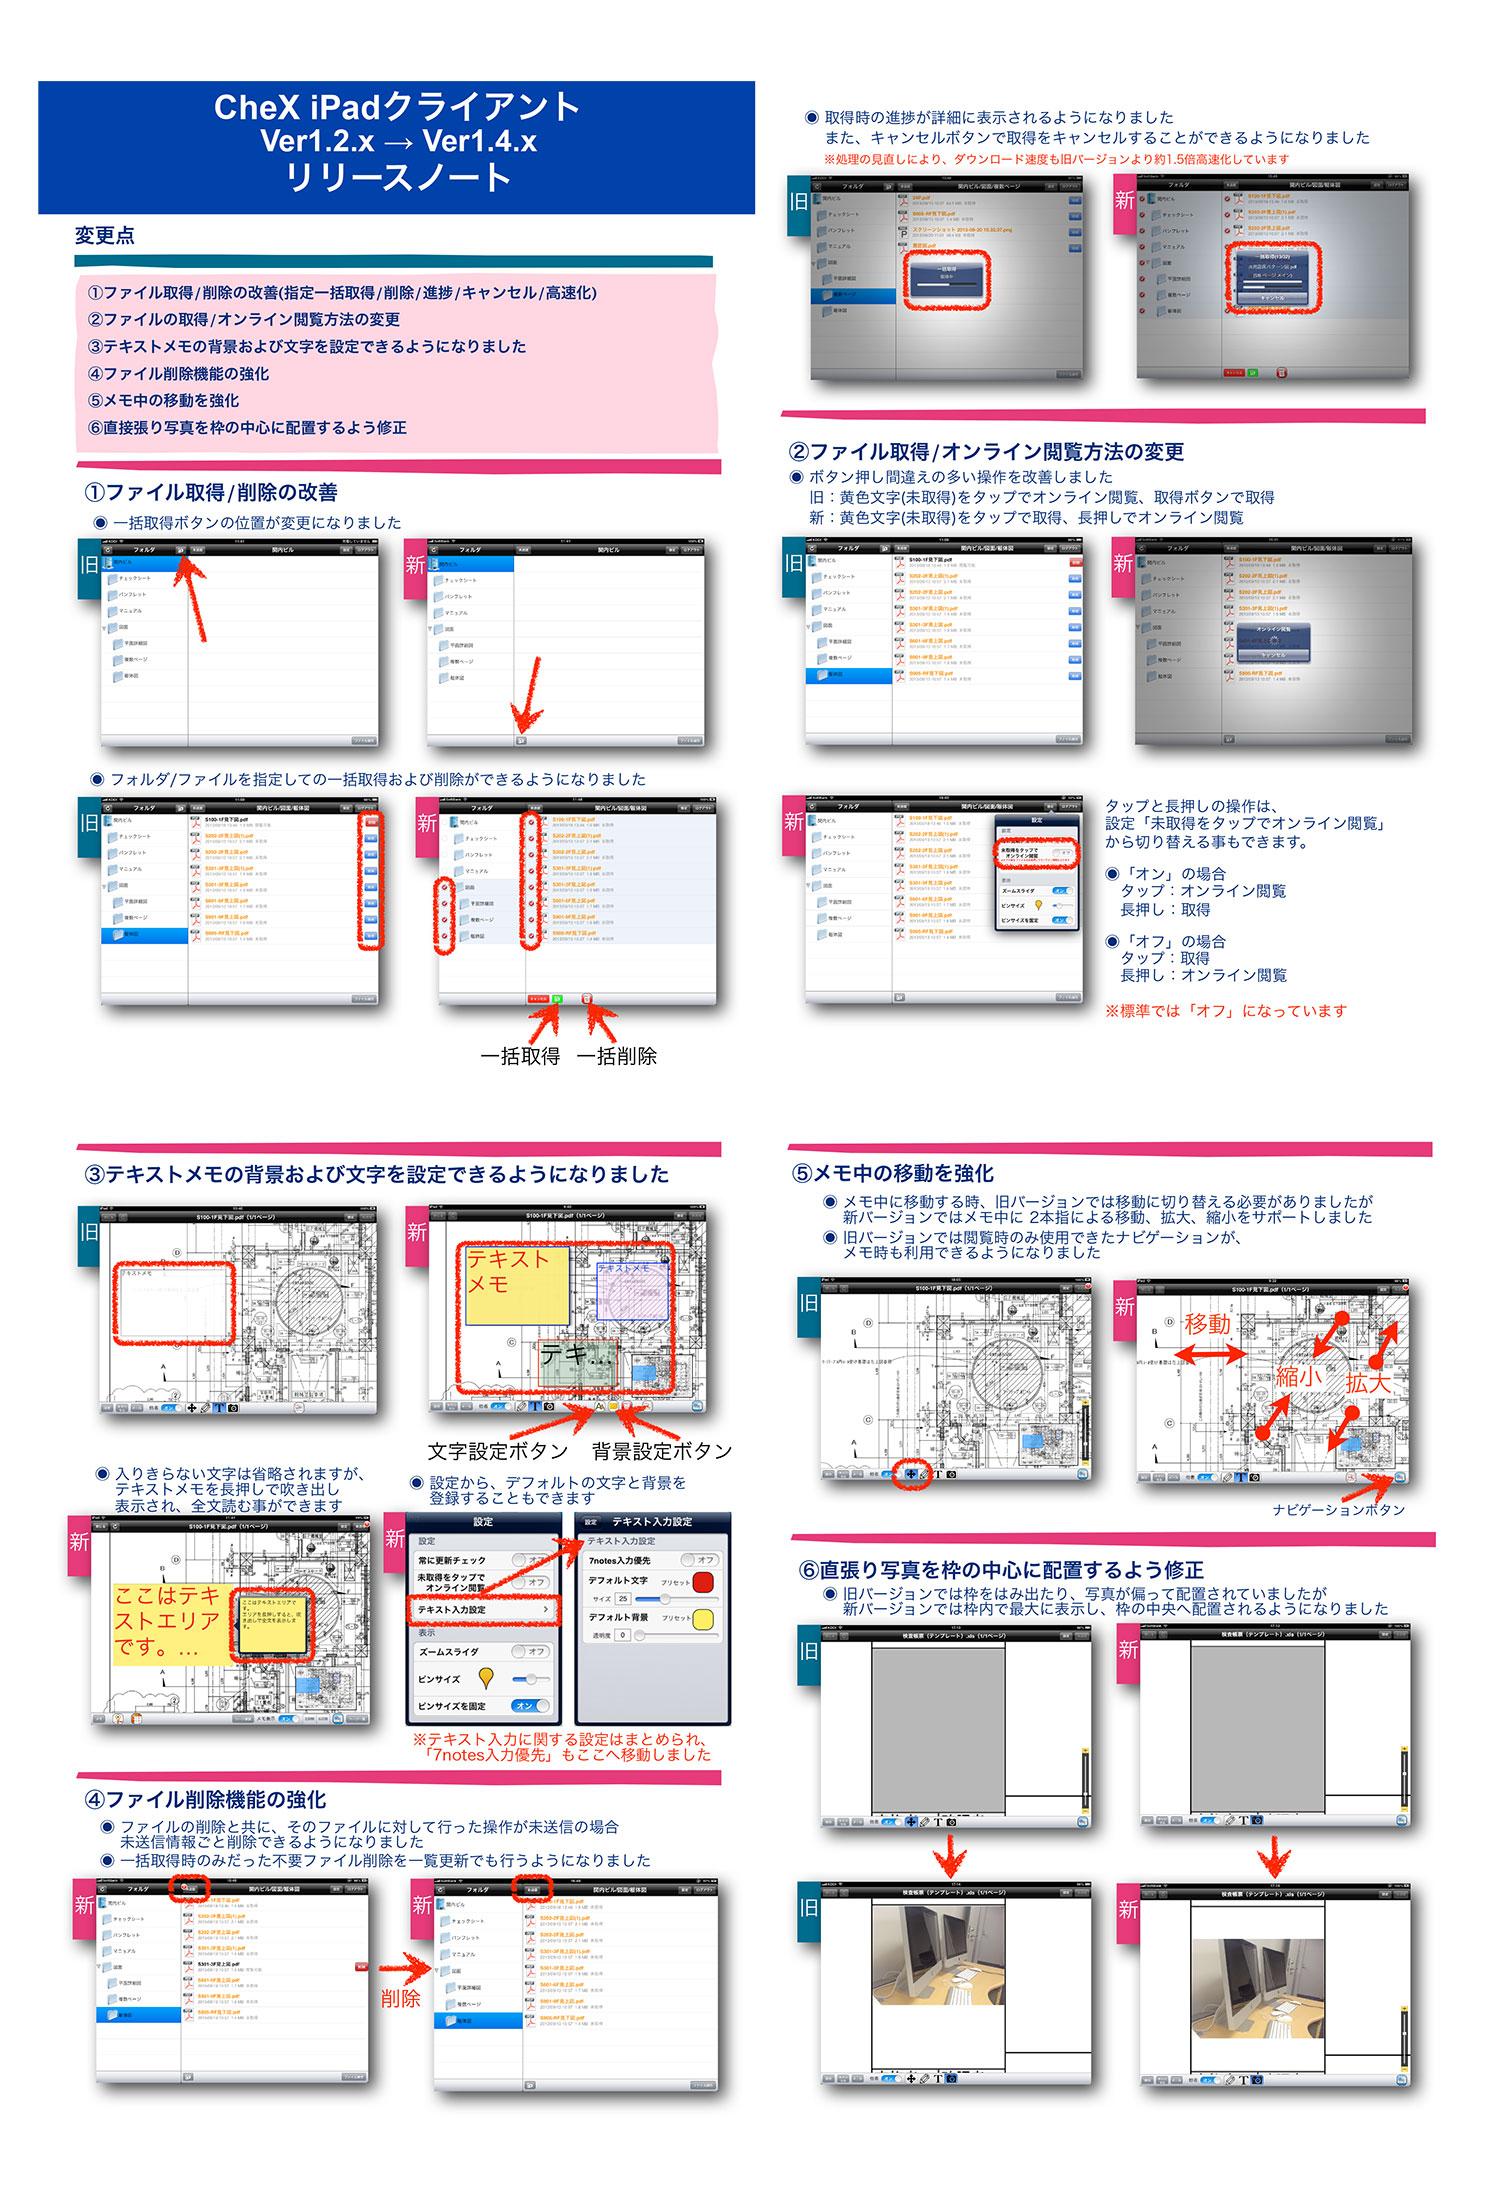 CheX Ver1.4.x の新機能(iPad) のお知らせ